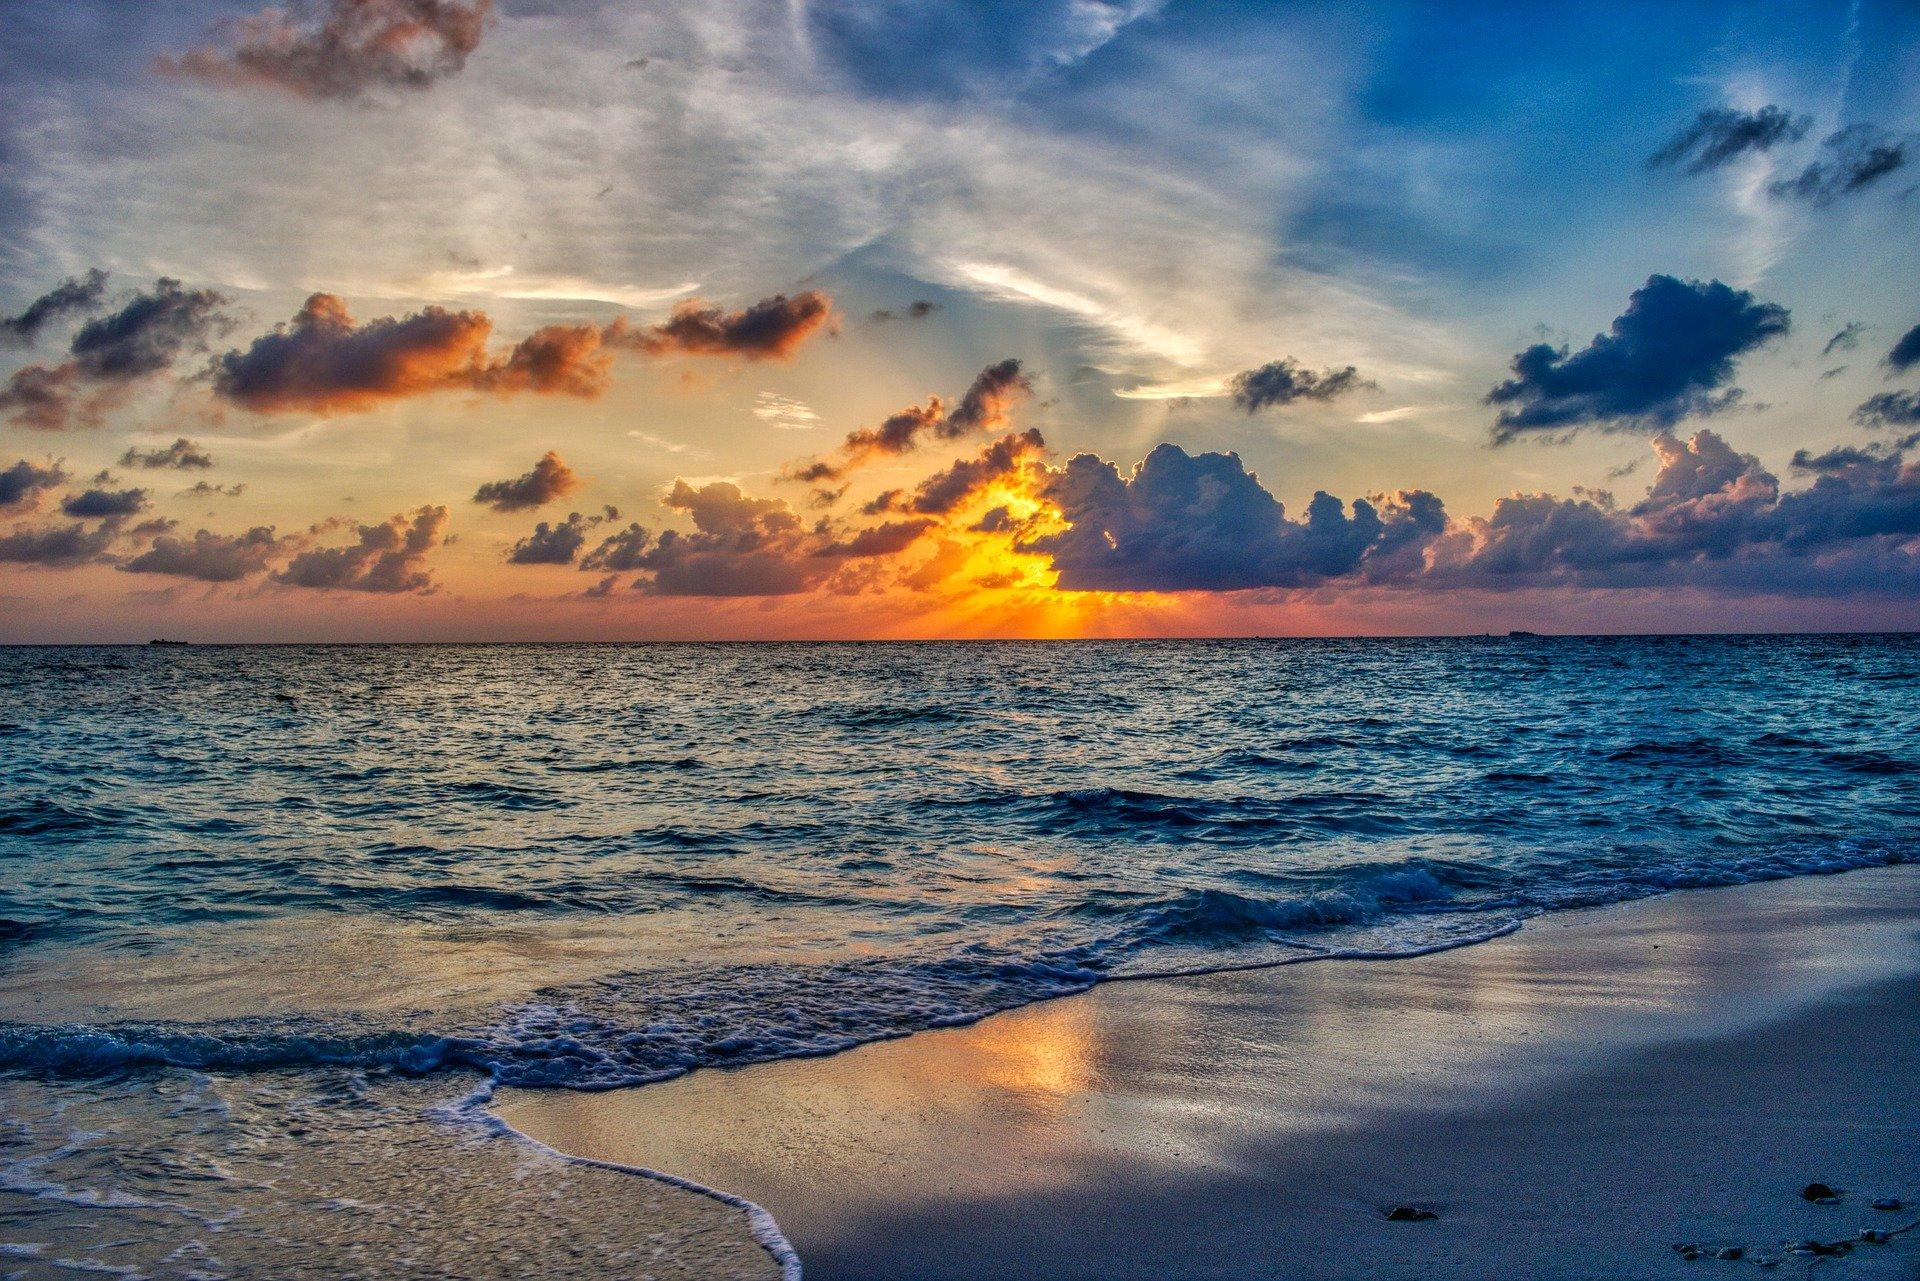 Sejur plaja Maldive, 10 zile - septembrie 2021